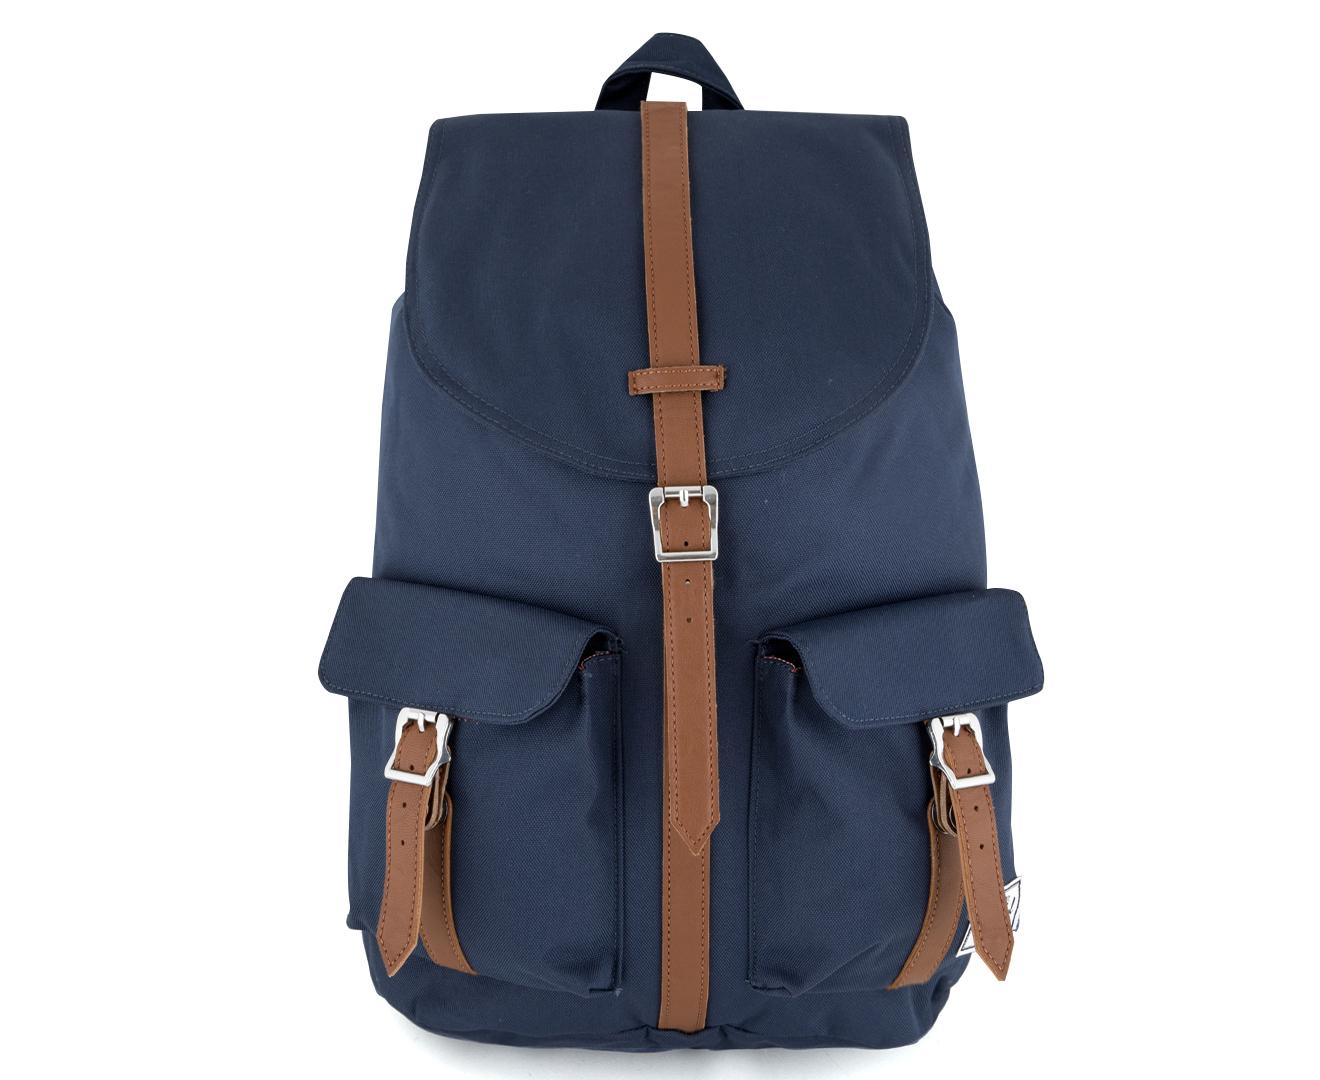 77d1ccddb70 Herschel Supply Co. 20.5L Dawson Backpack - Navy 828432082681